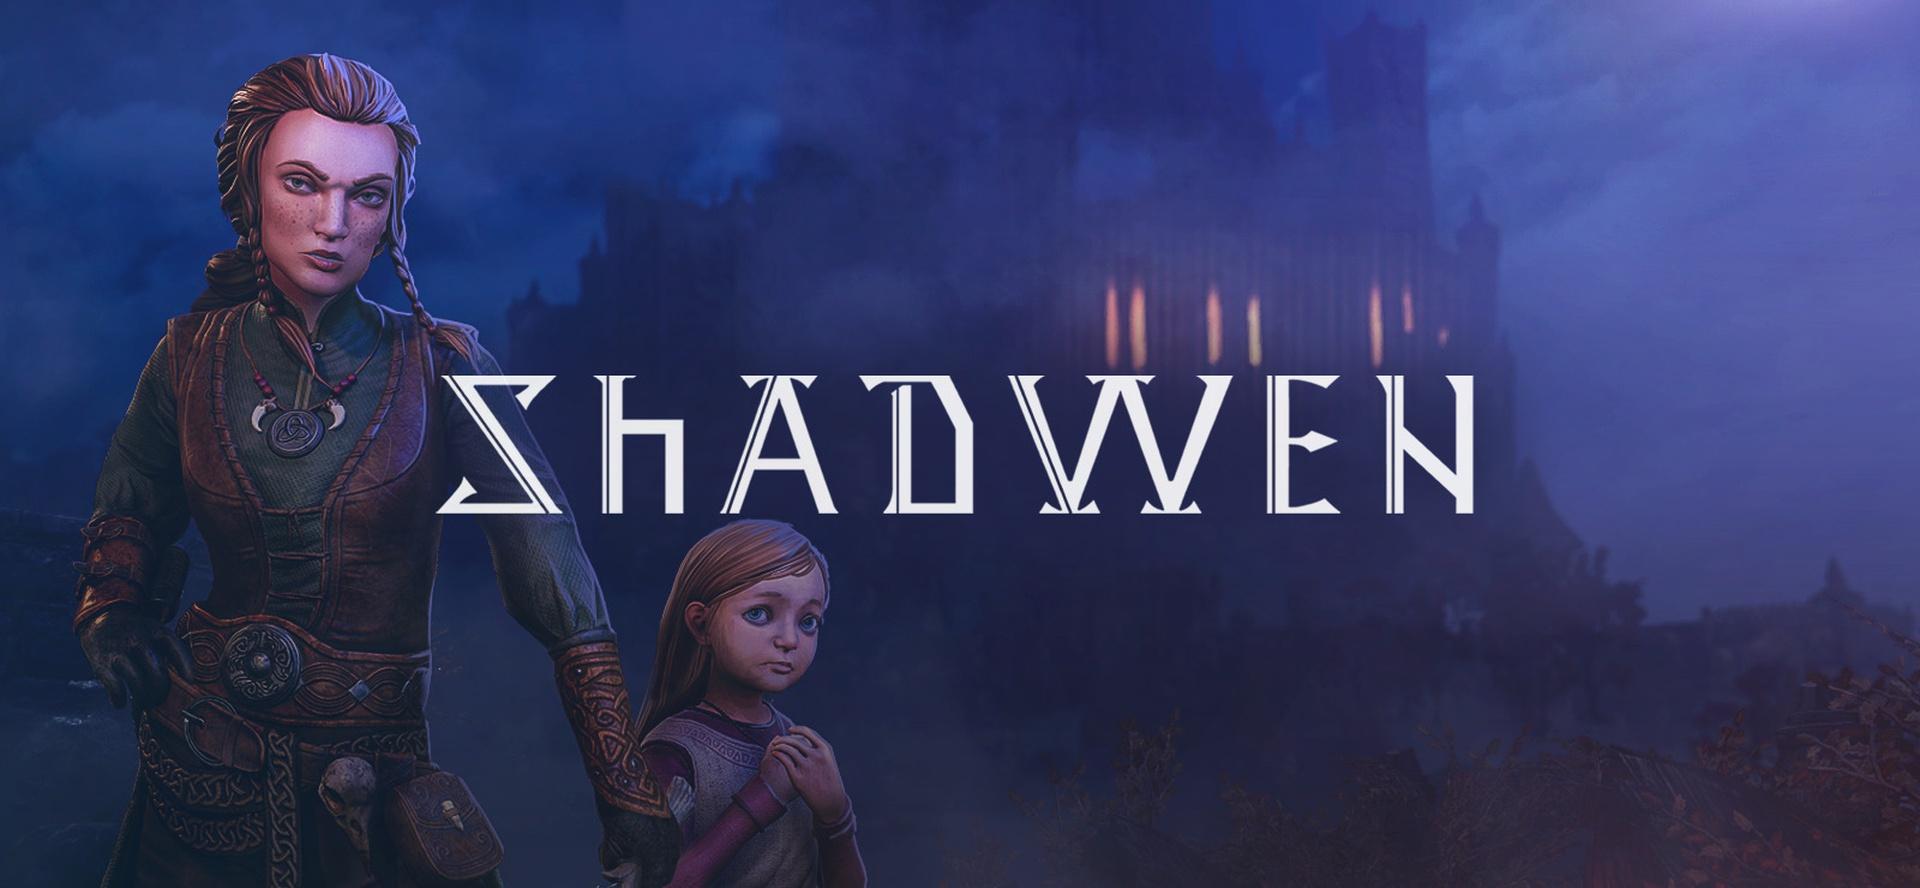 Shadwen